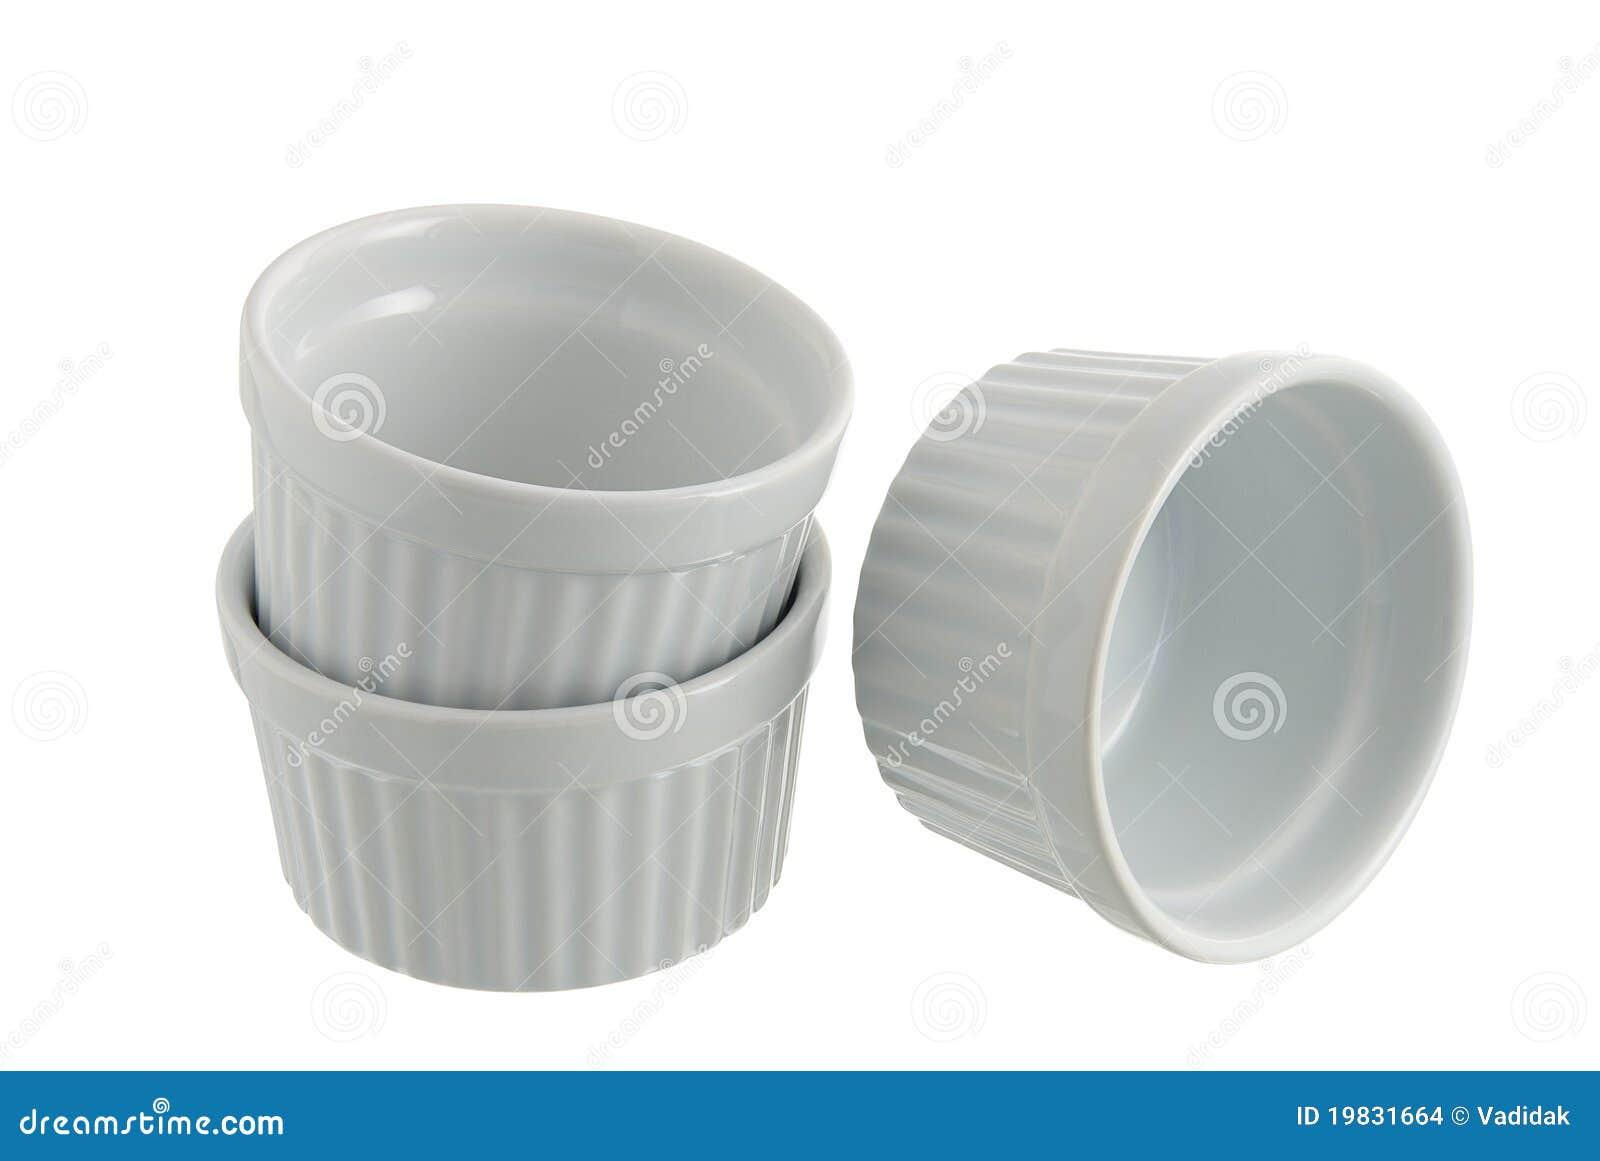 Three White Ceramic Individual Baking Pans Stock Photo